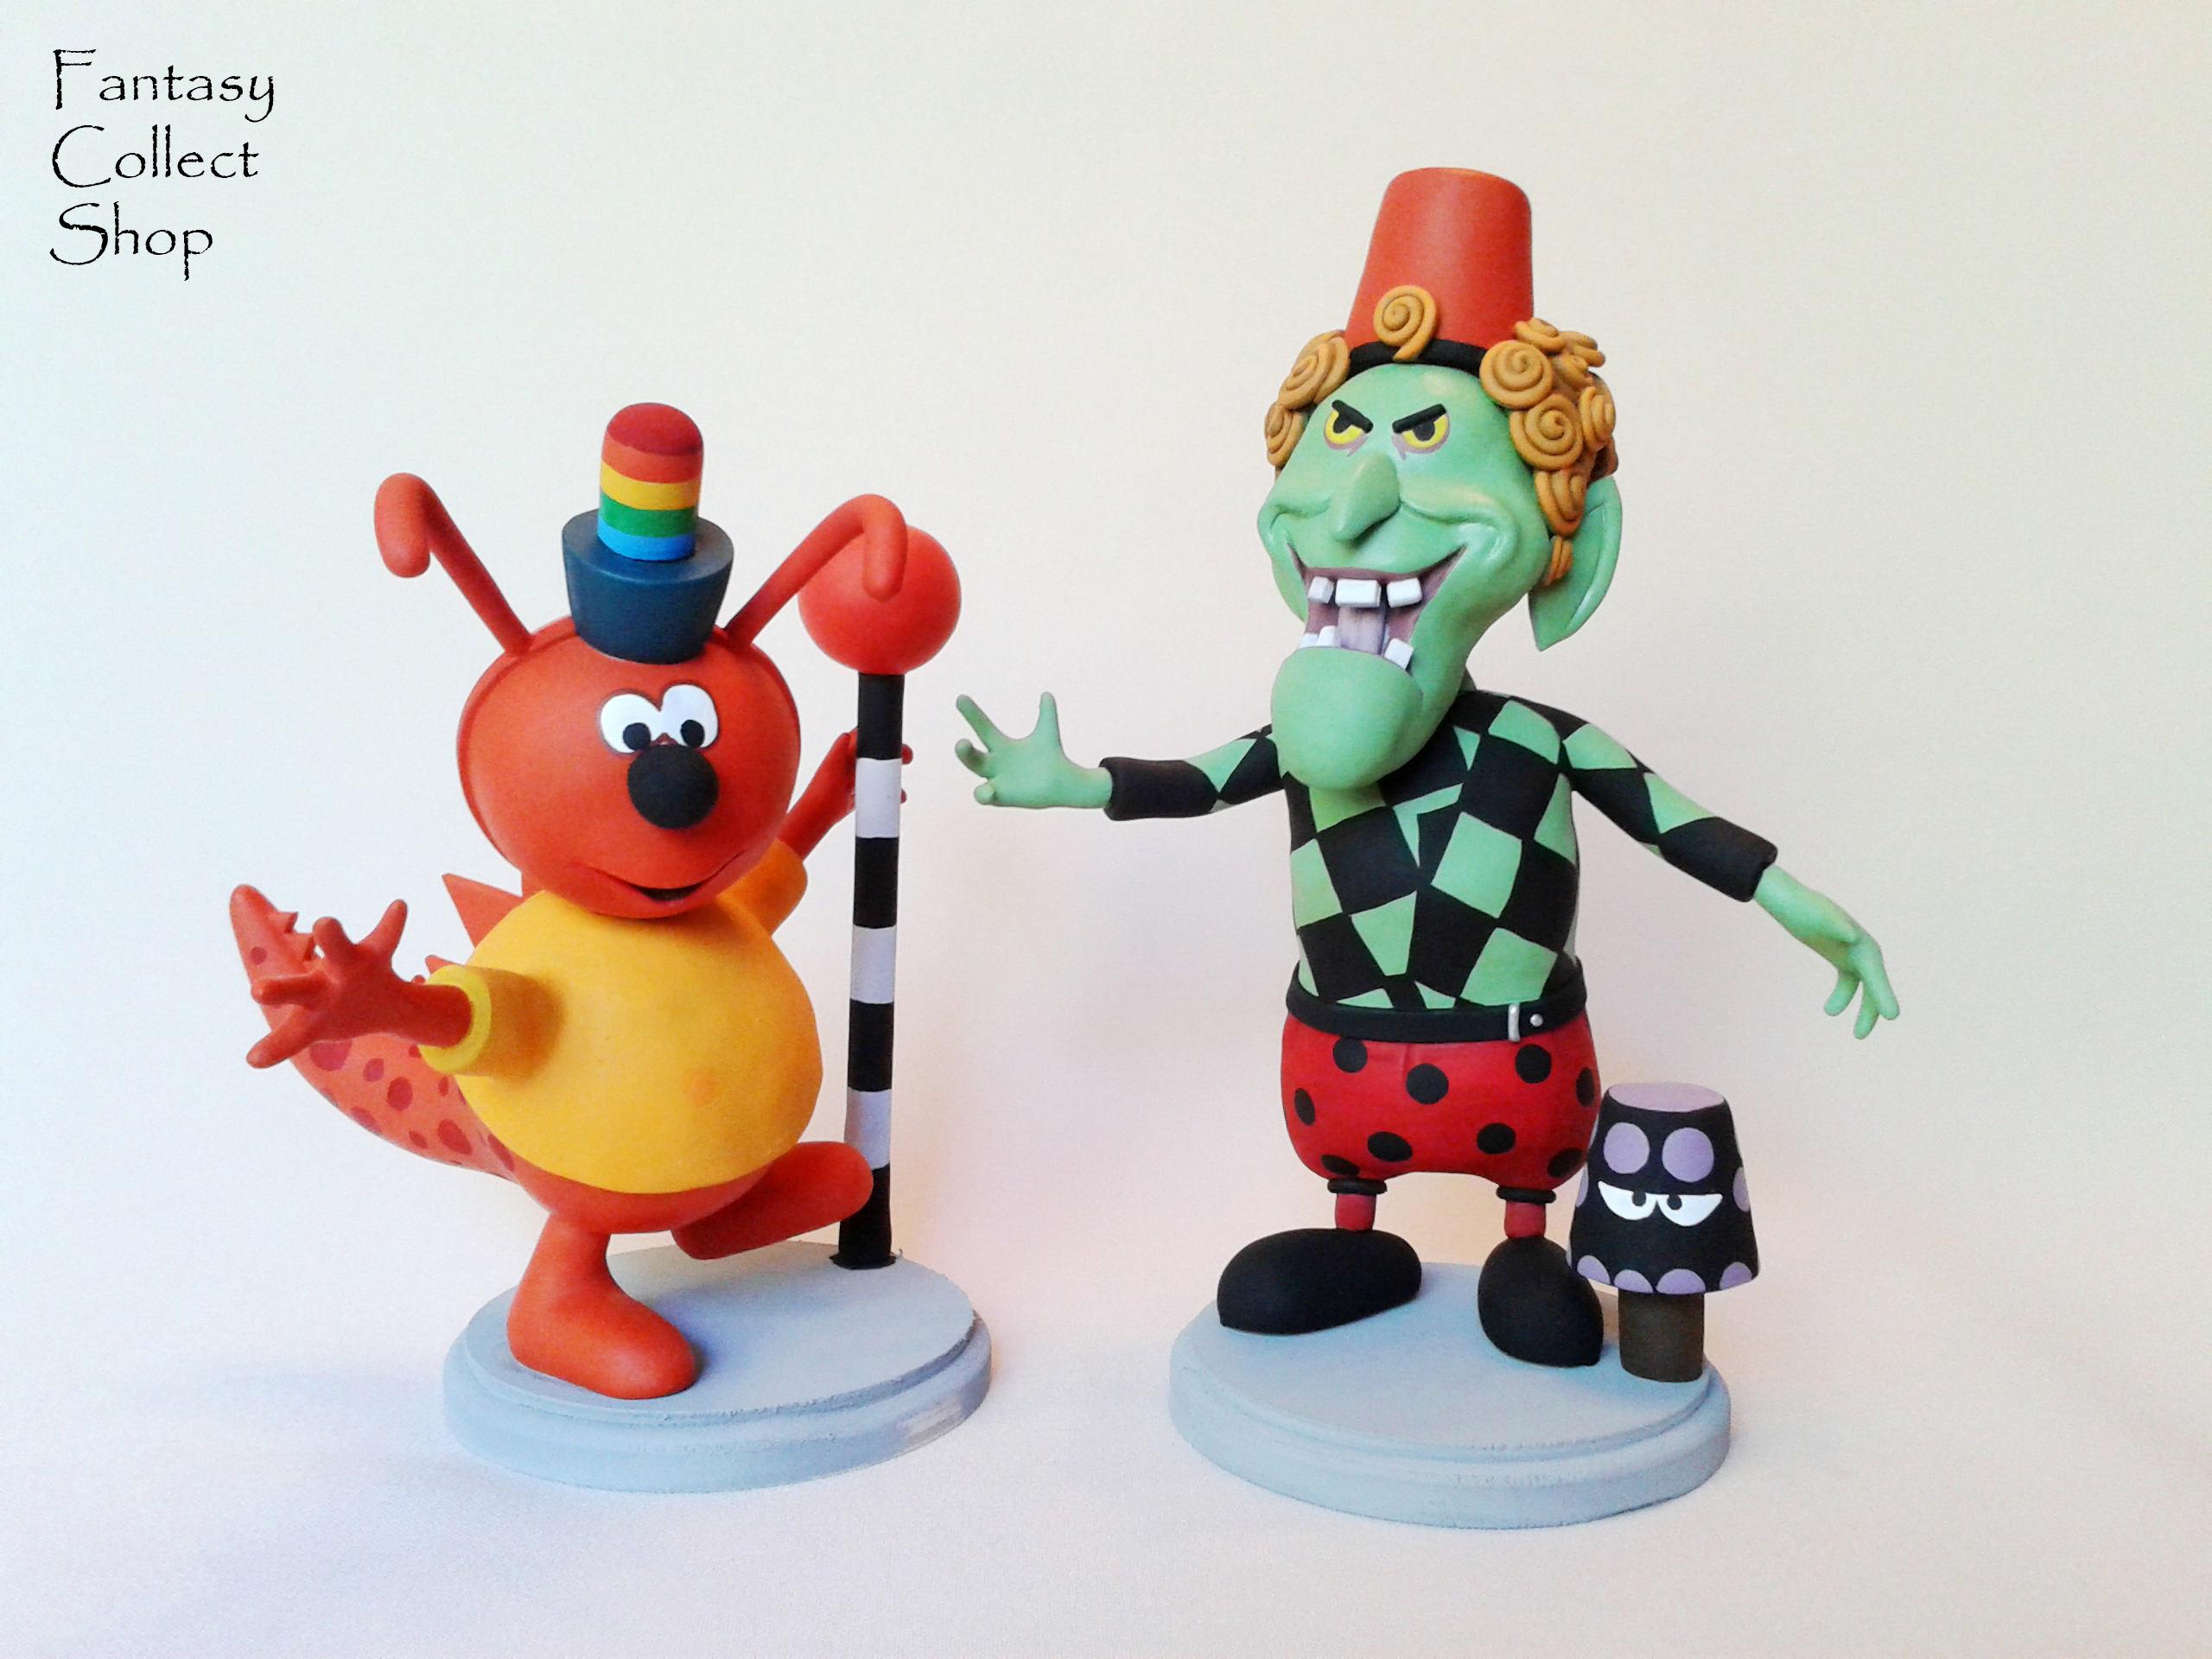 Chorlton and Finella figurines from Chorlton and the Wheelies cartoon  handmade figure Toys sculpture